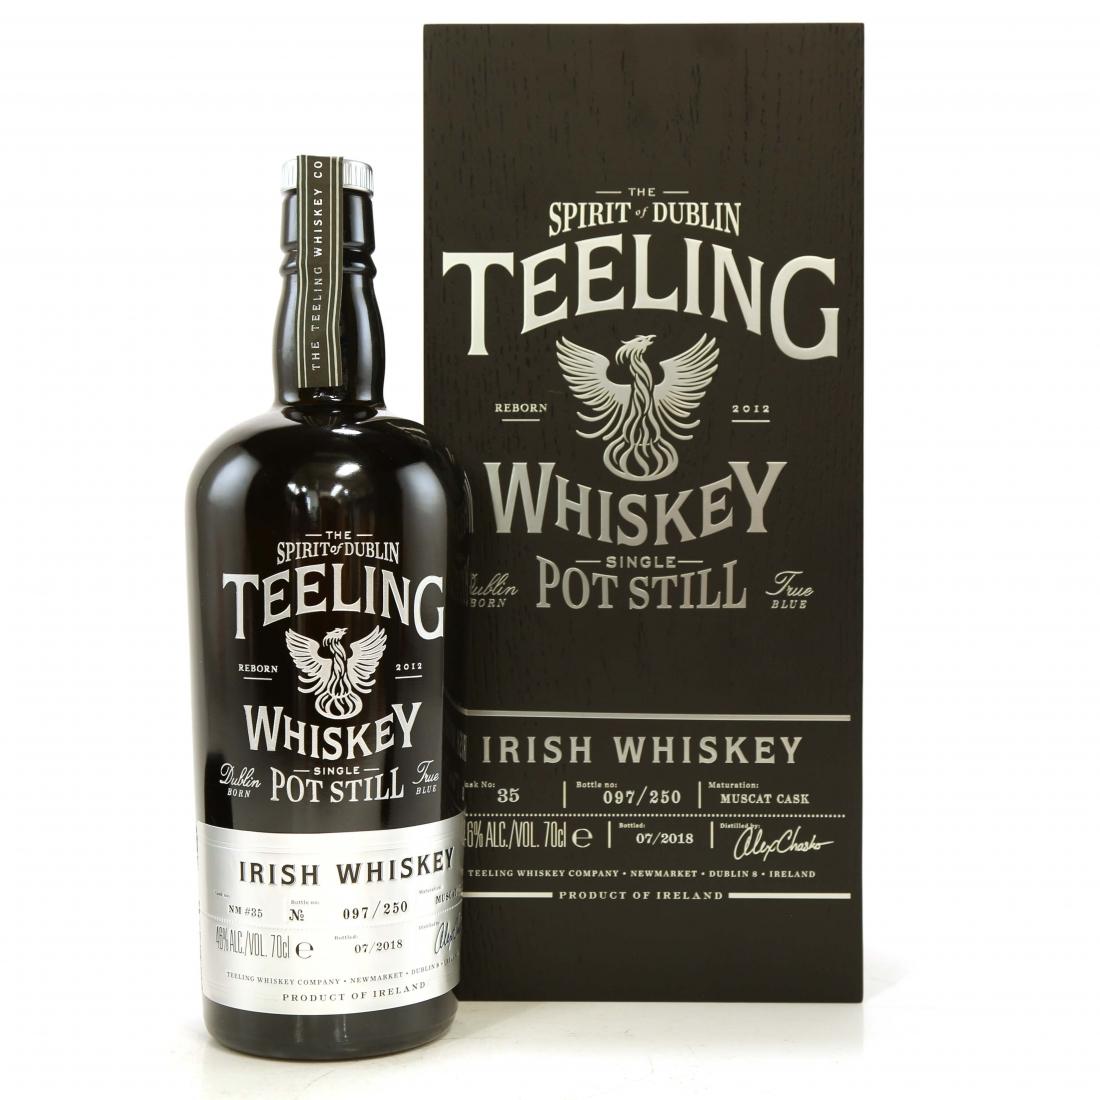 Teeling Celebratory Single Pot Still Whiskey / Bottle #097